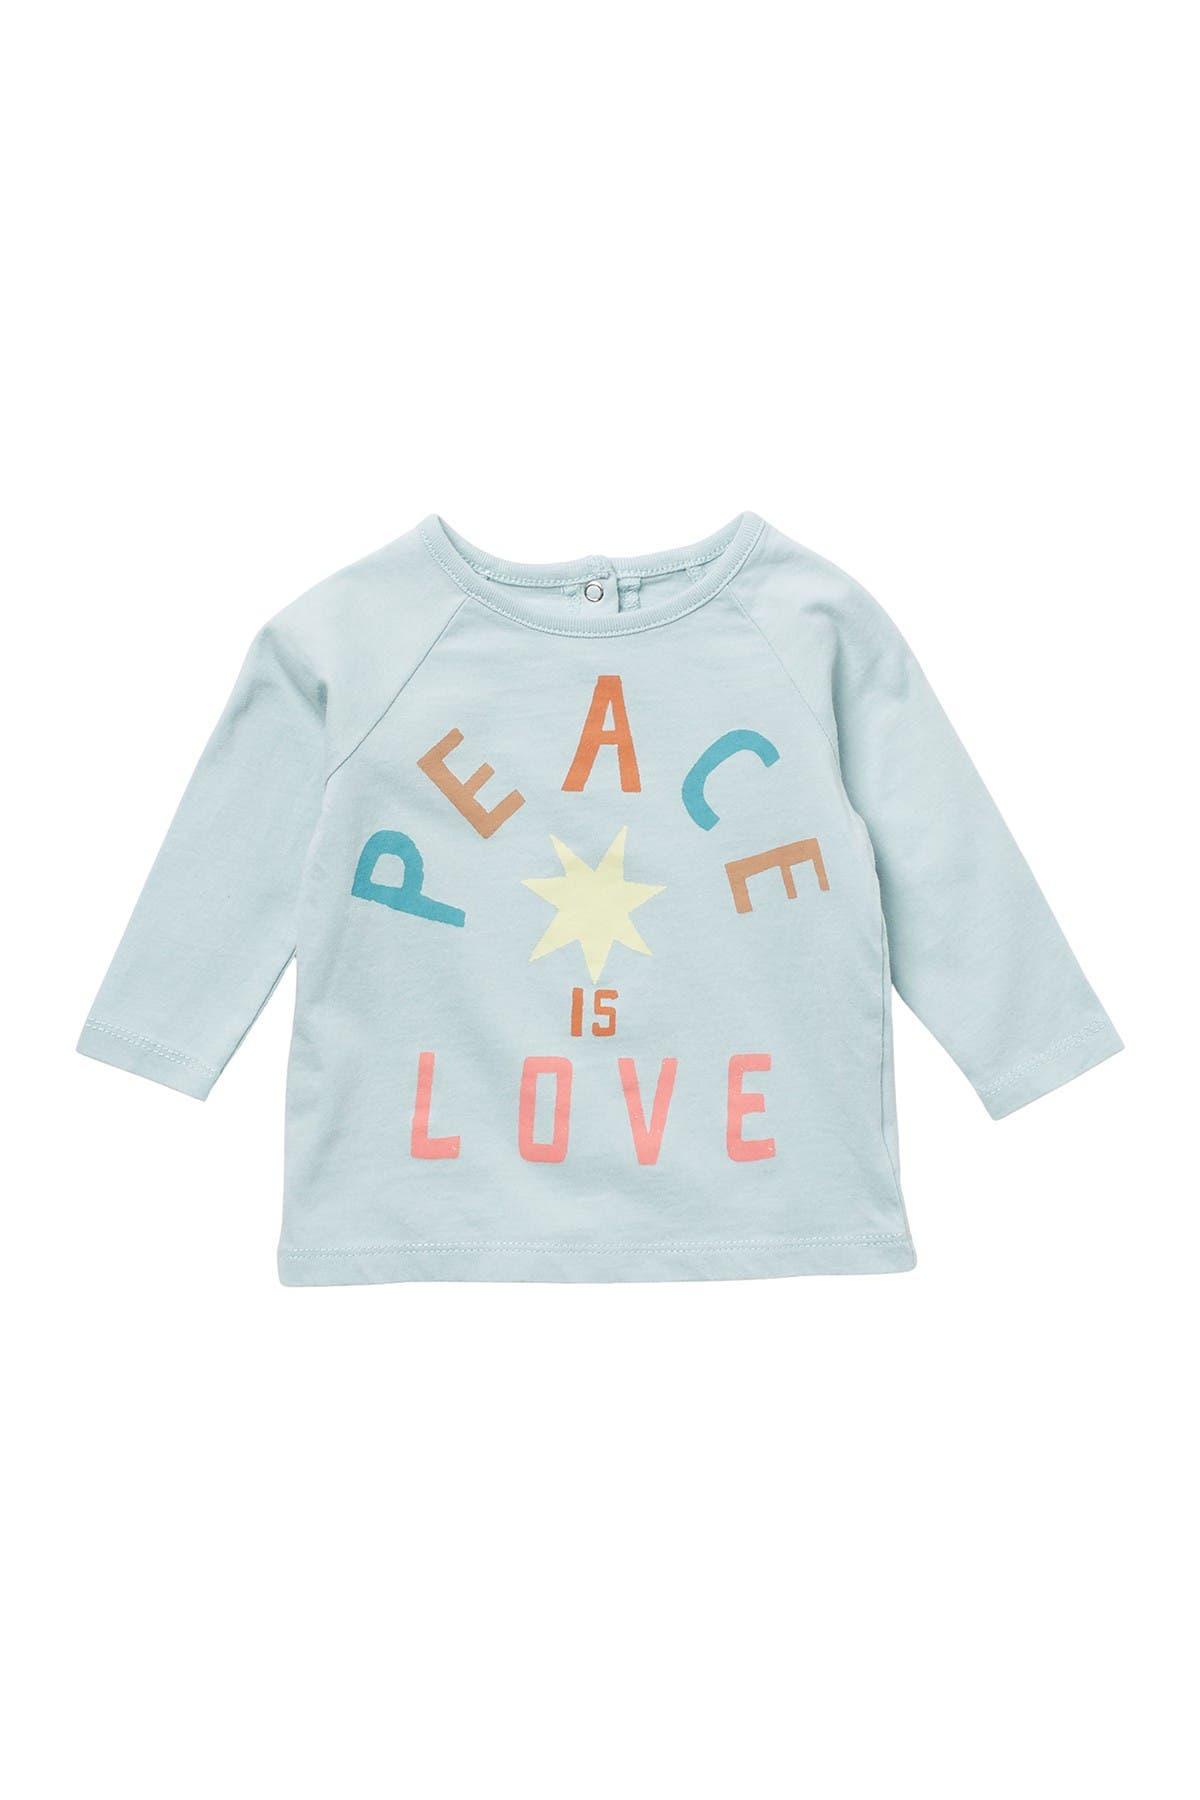 Image of PEEK ESSENTIALS Emmerson Peach Is Love Long Sleeve T-Shirt